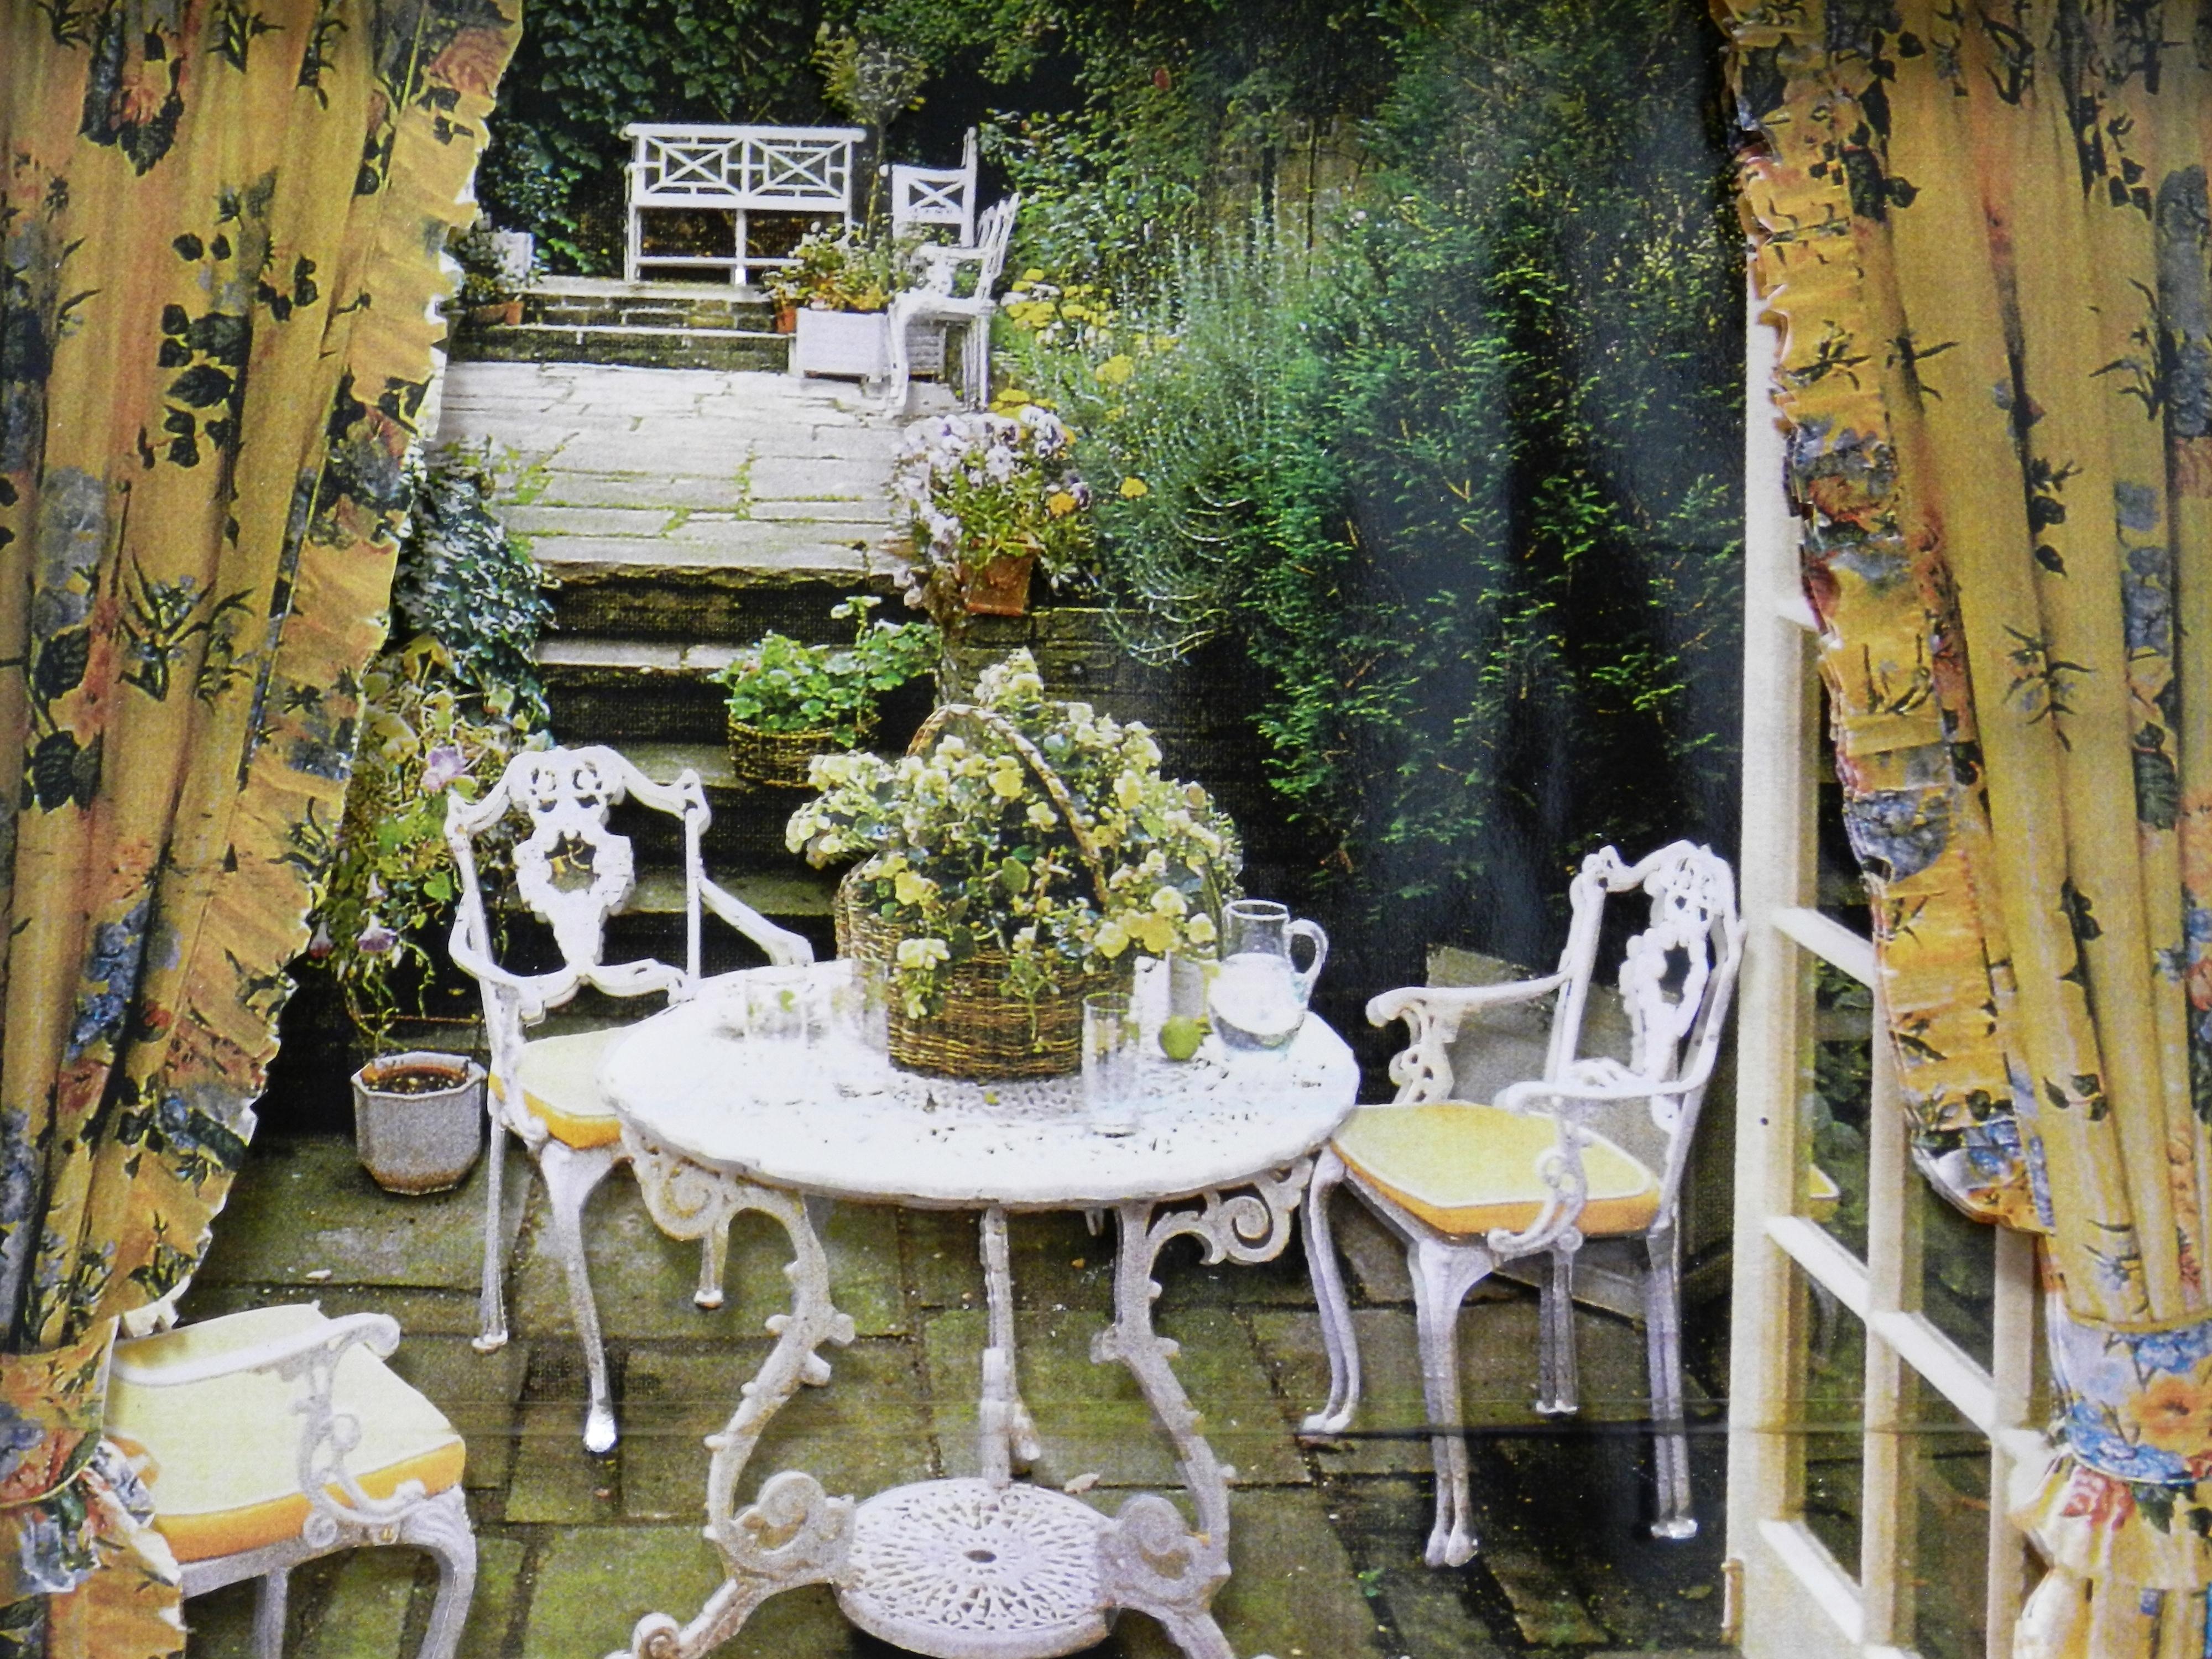 403 cadeiras na varanda 403 cadeiras na varanda #90763B 4000x3000